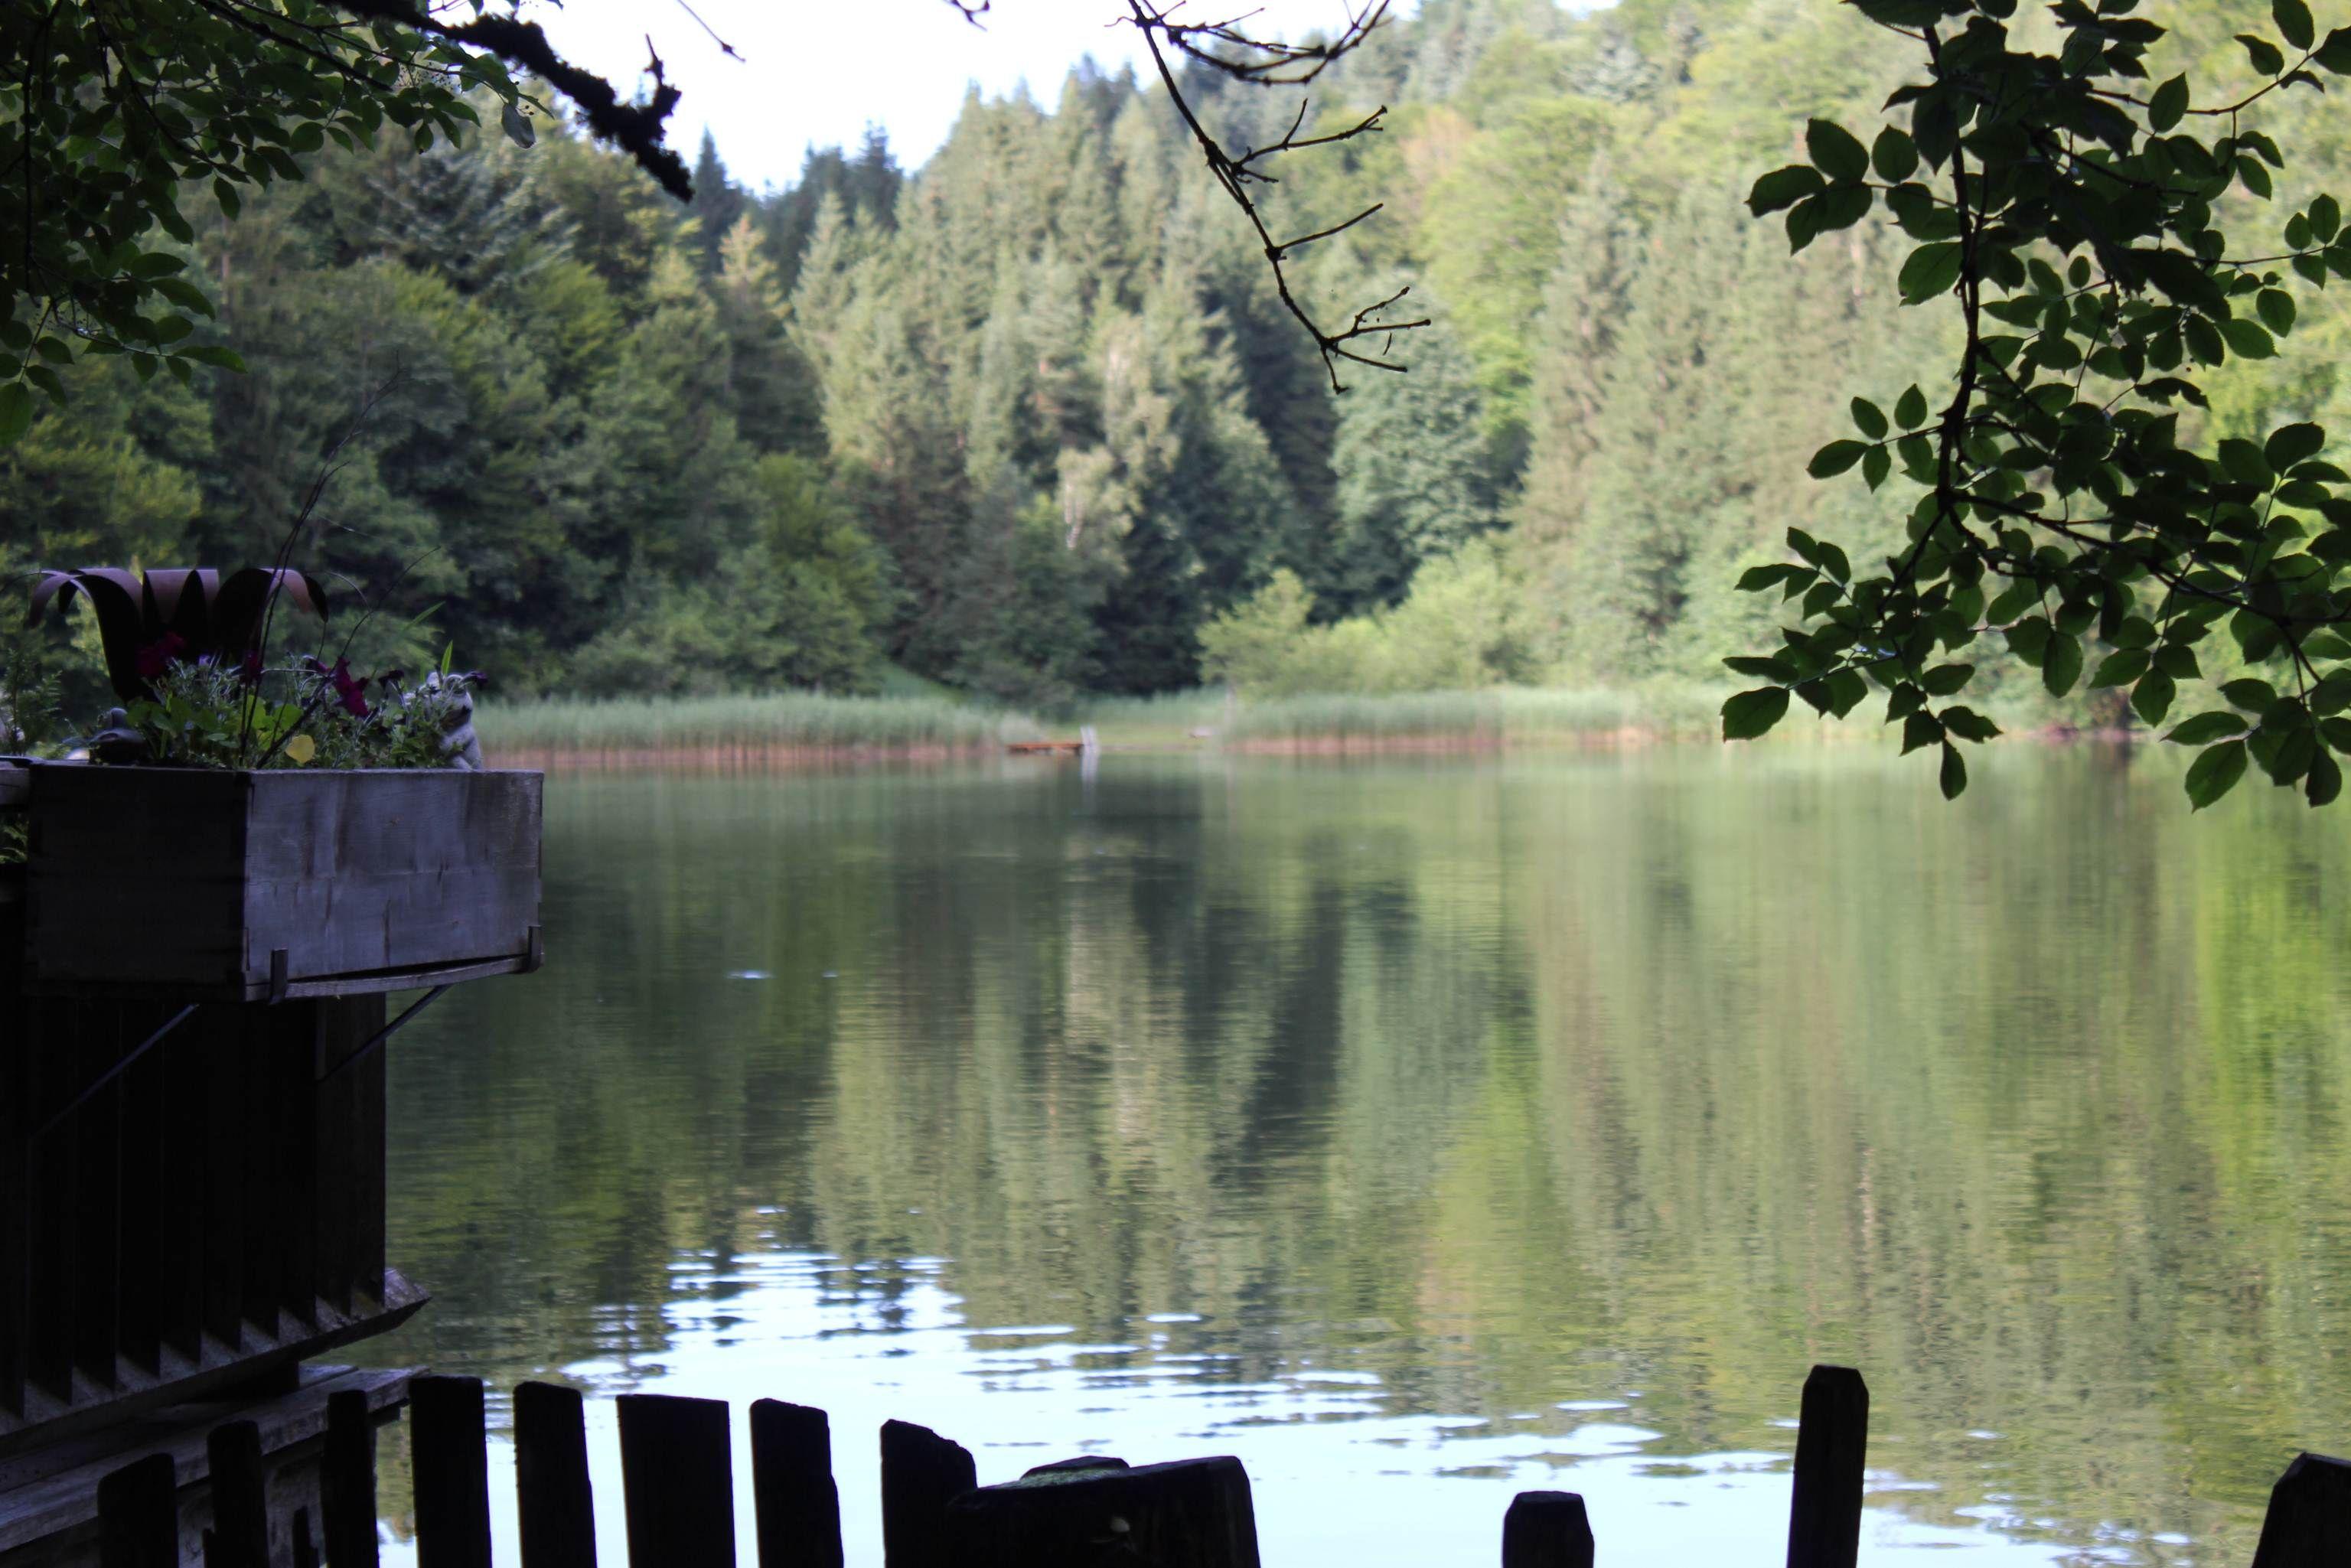 Hütte am einsamen Bergsee